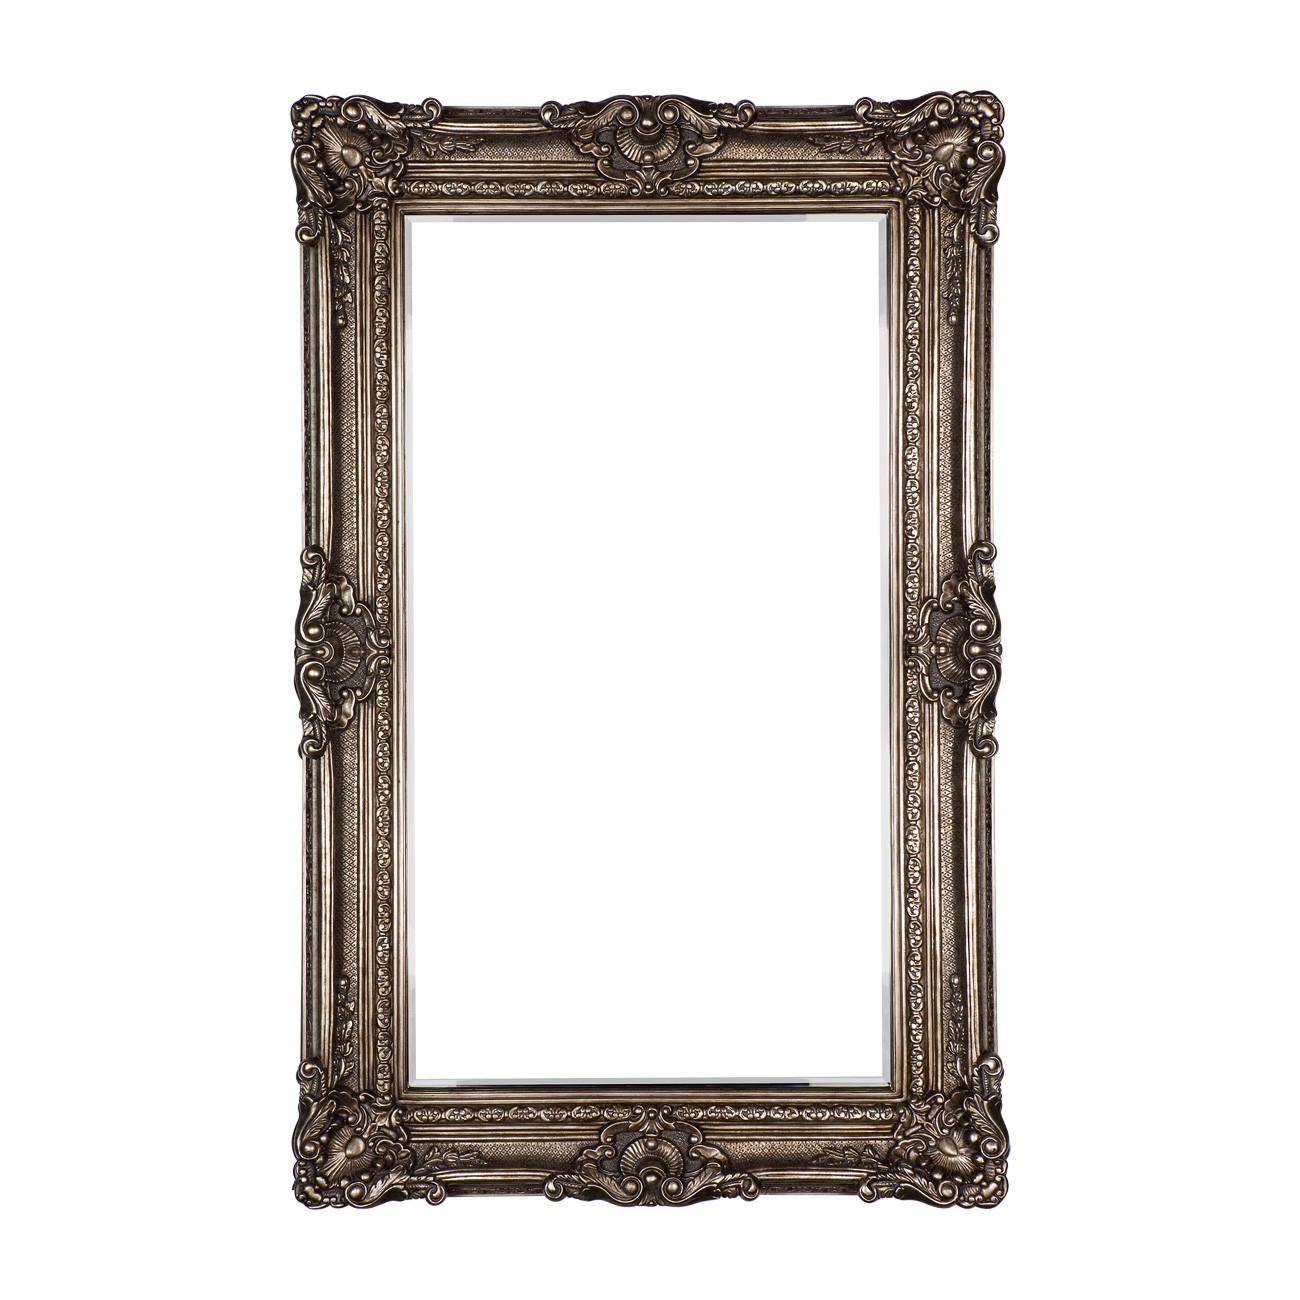 Alexandra Baroque Floor Mirror, 224cm